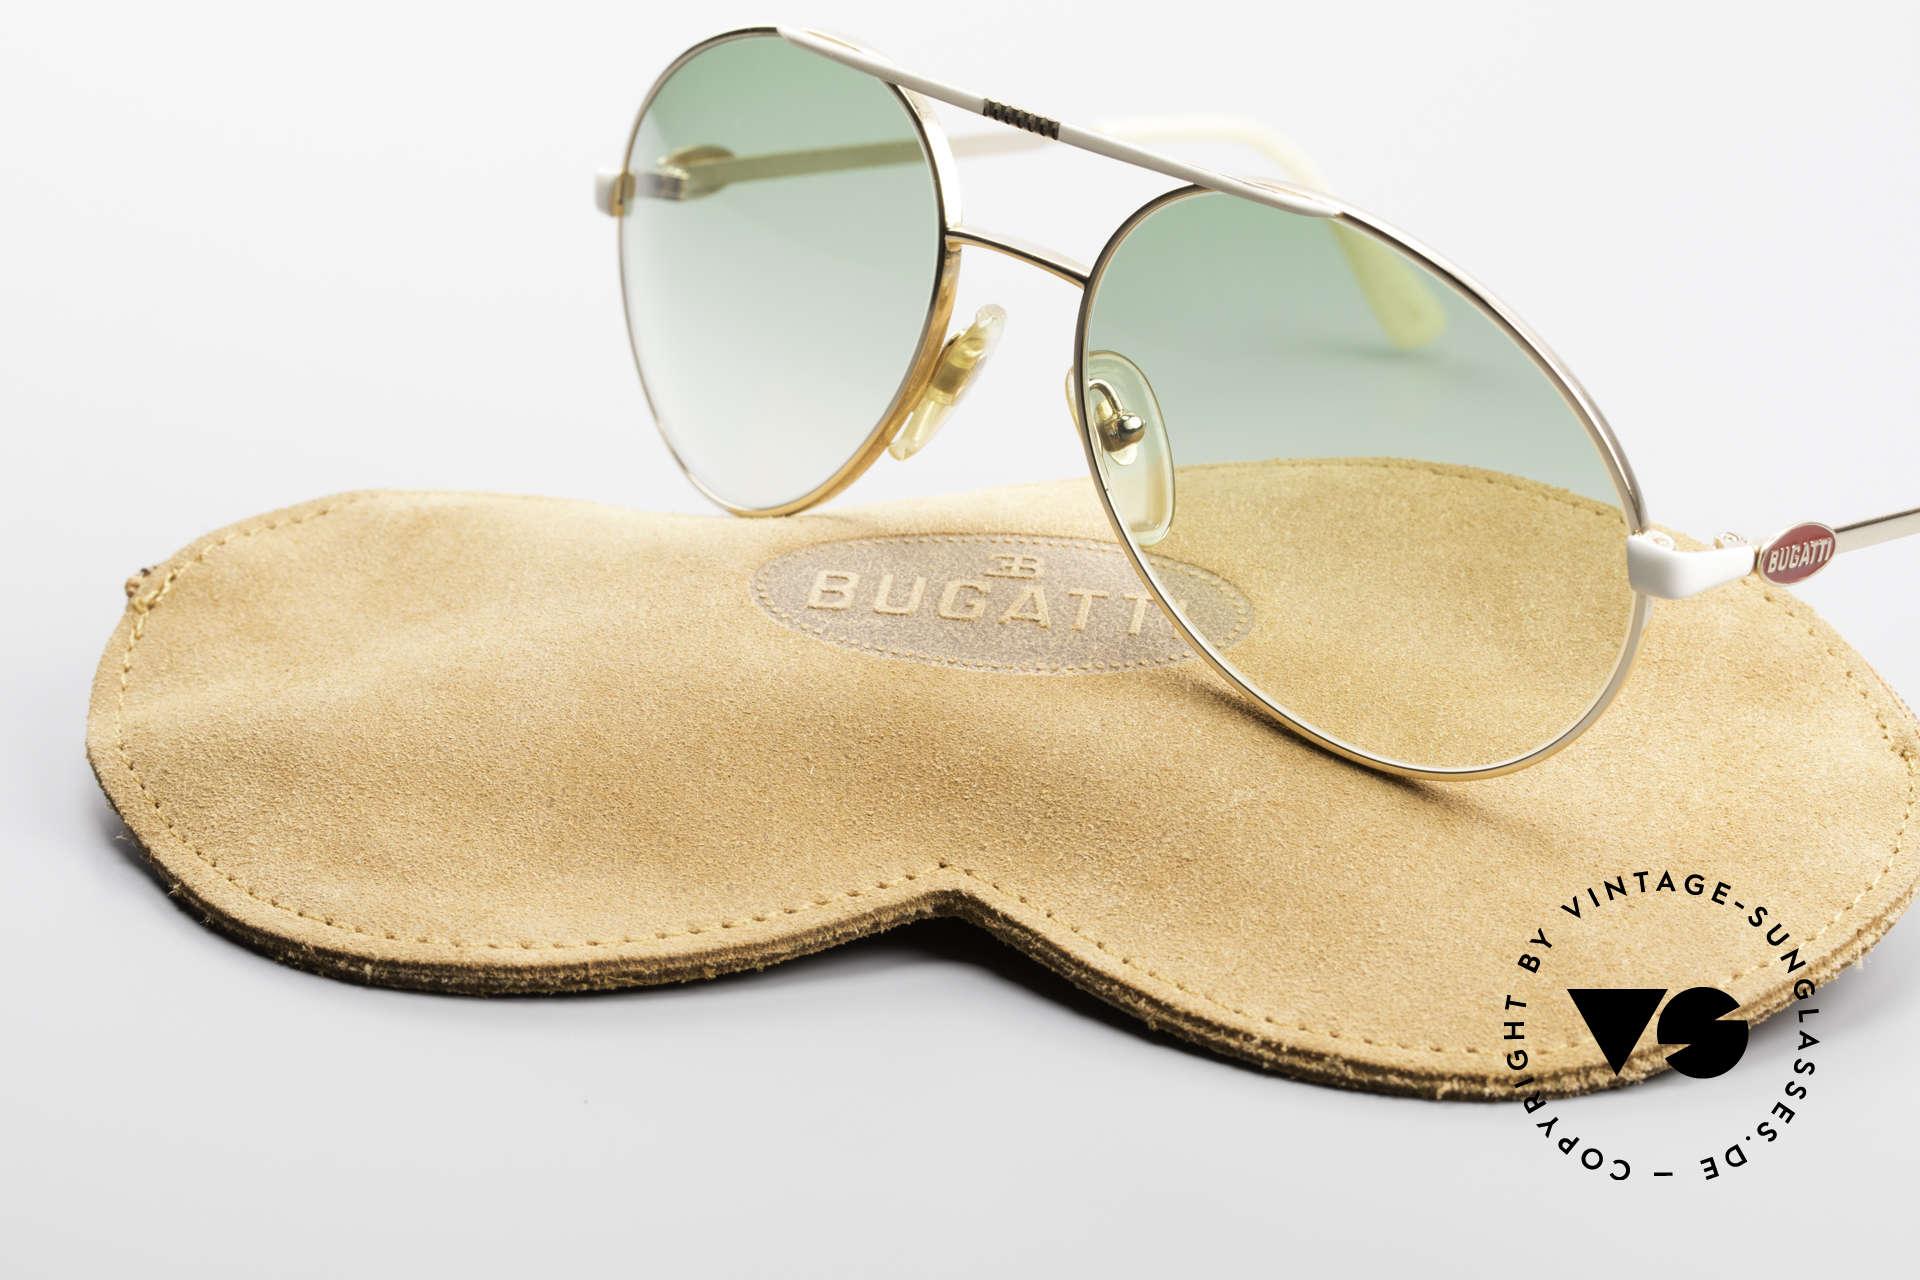 Bugatti 64319 Original 80's Sunglasses Men, green sun lenses can be replaced optionally, Made for Men